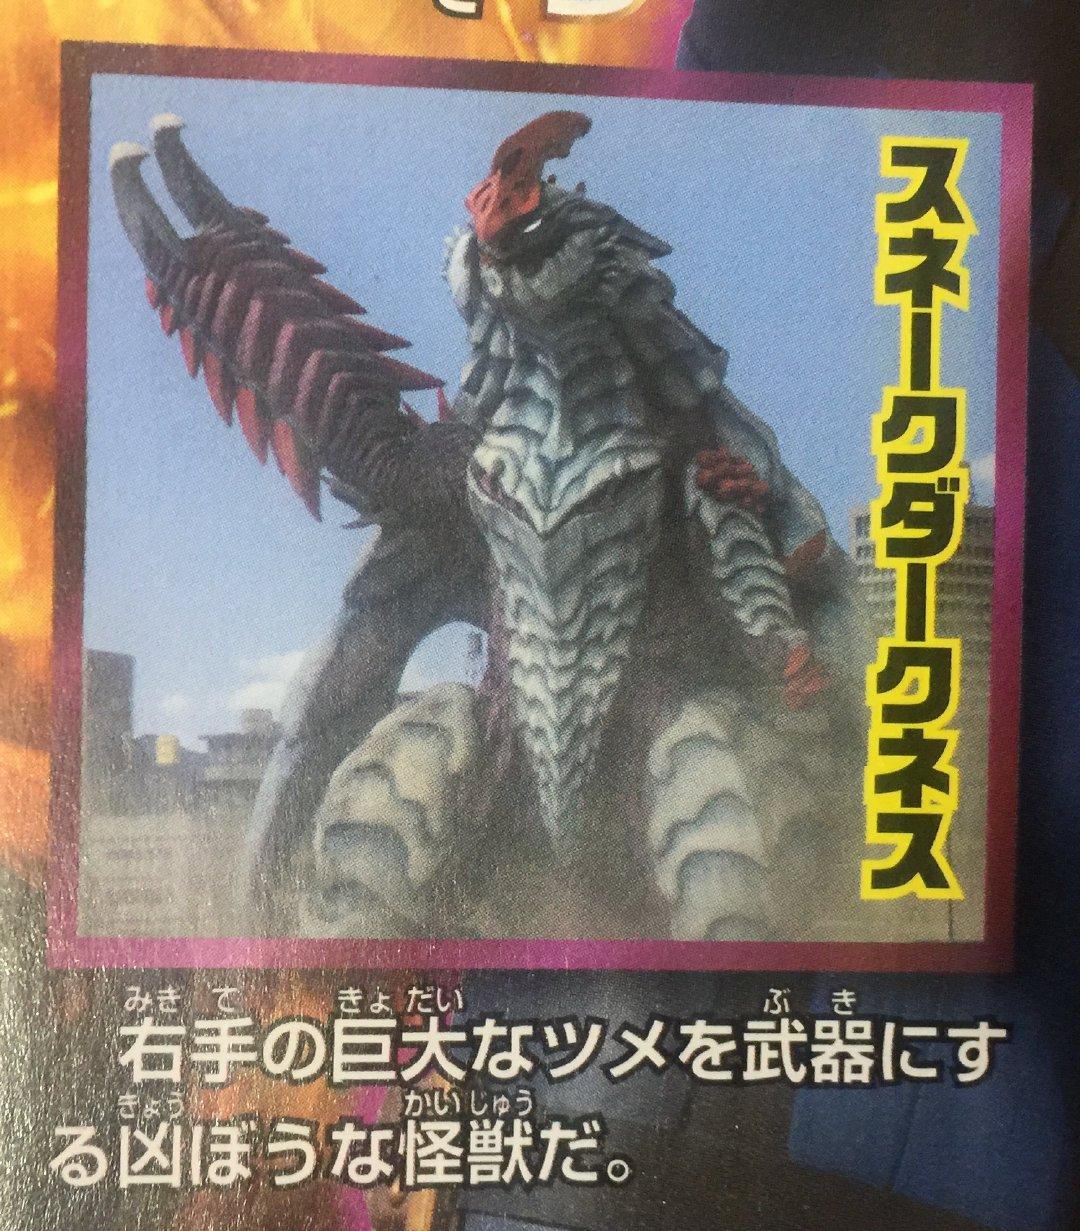 Snake Darkness - Ultraman Ruebe The Movie